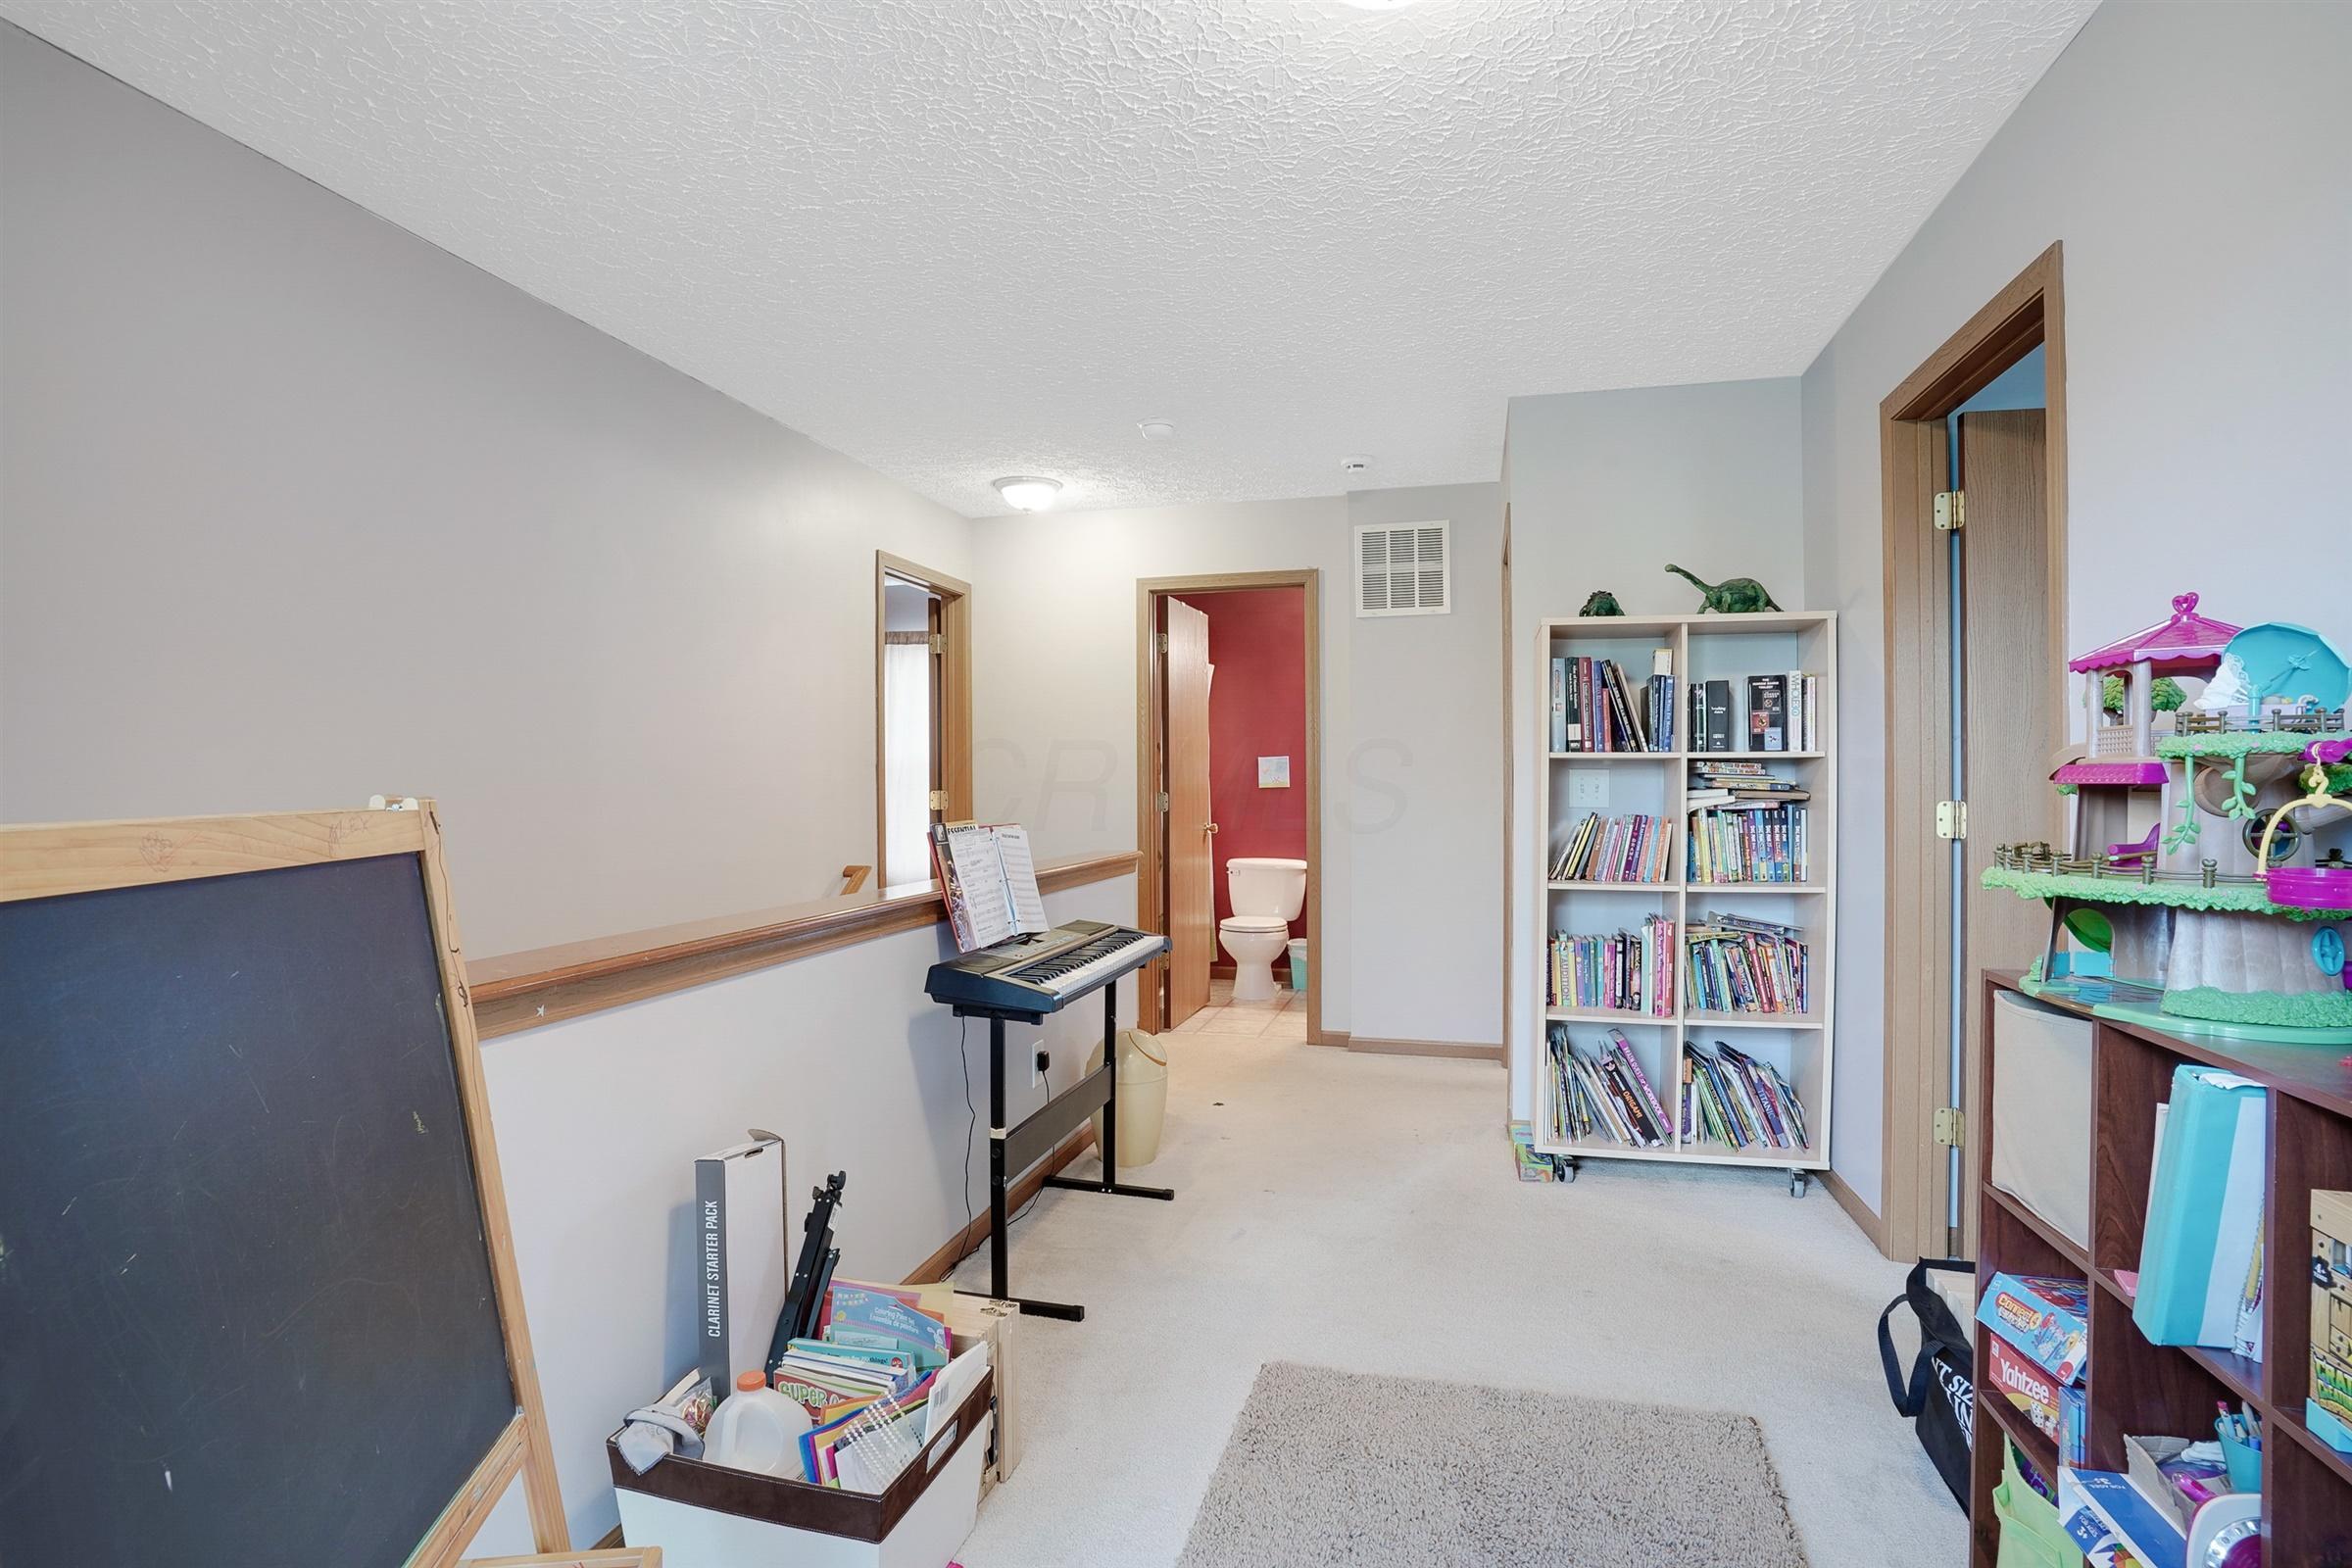 8206 Creekstone Lane, Blacklick, Ohio 43004, 3 Bedrooms Bedrooms, ,3 BathroomsBathrooms,Residential,For Sale,Creekstone,220025812